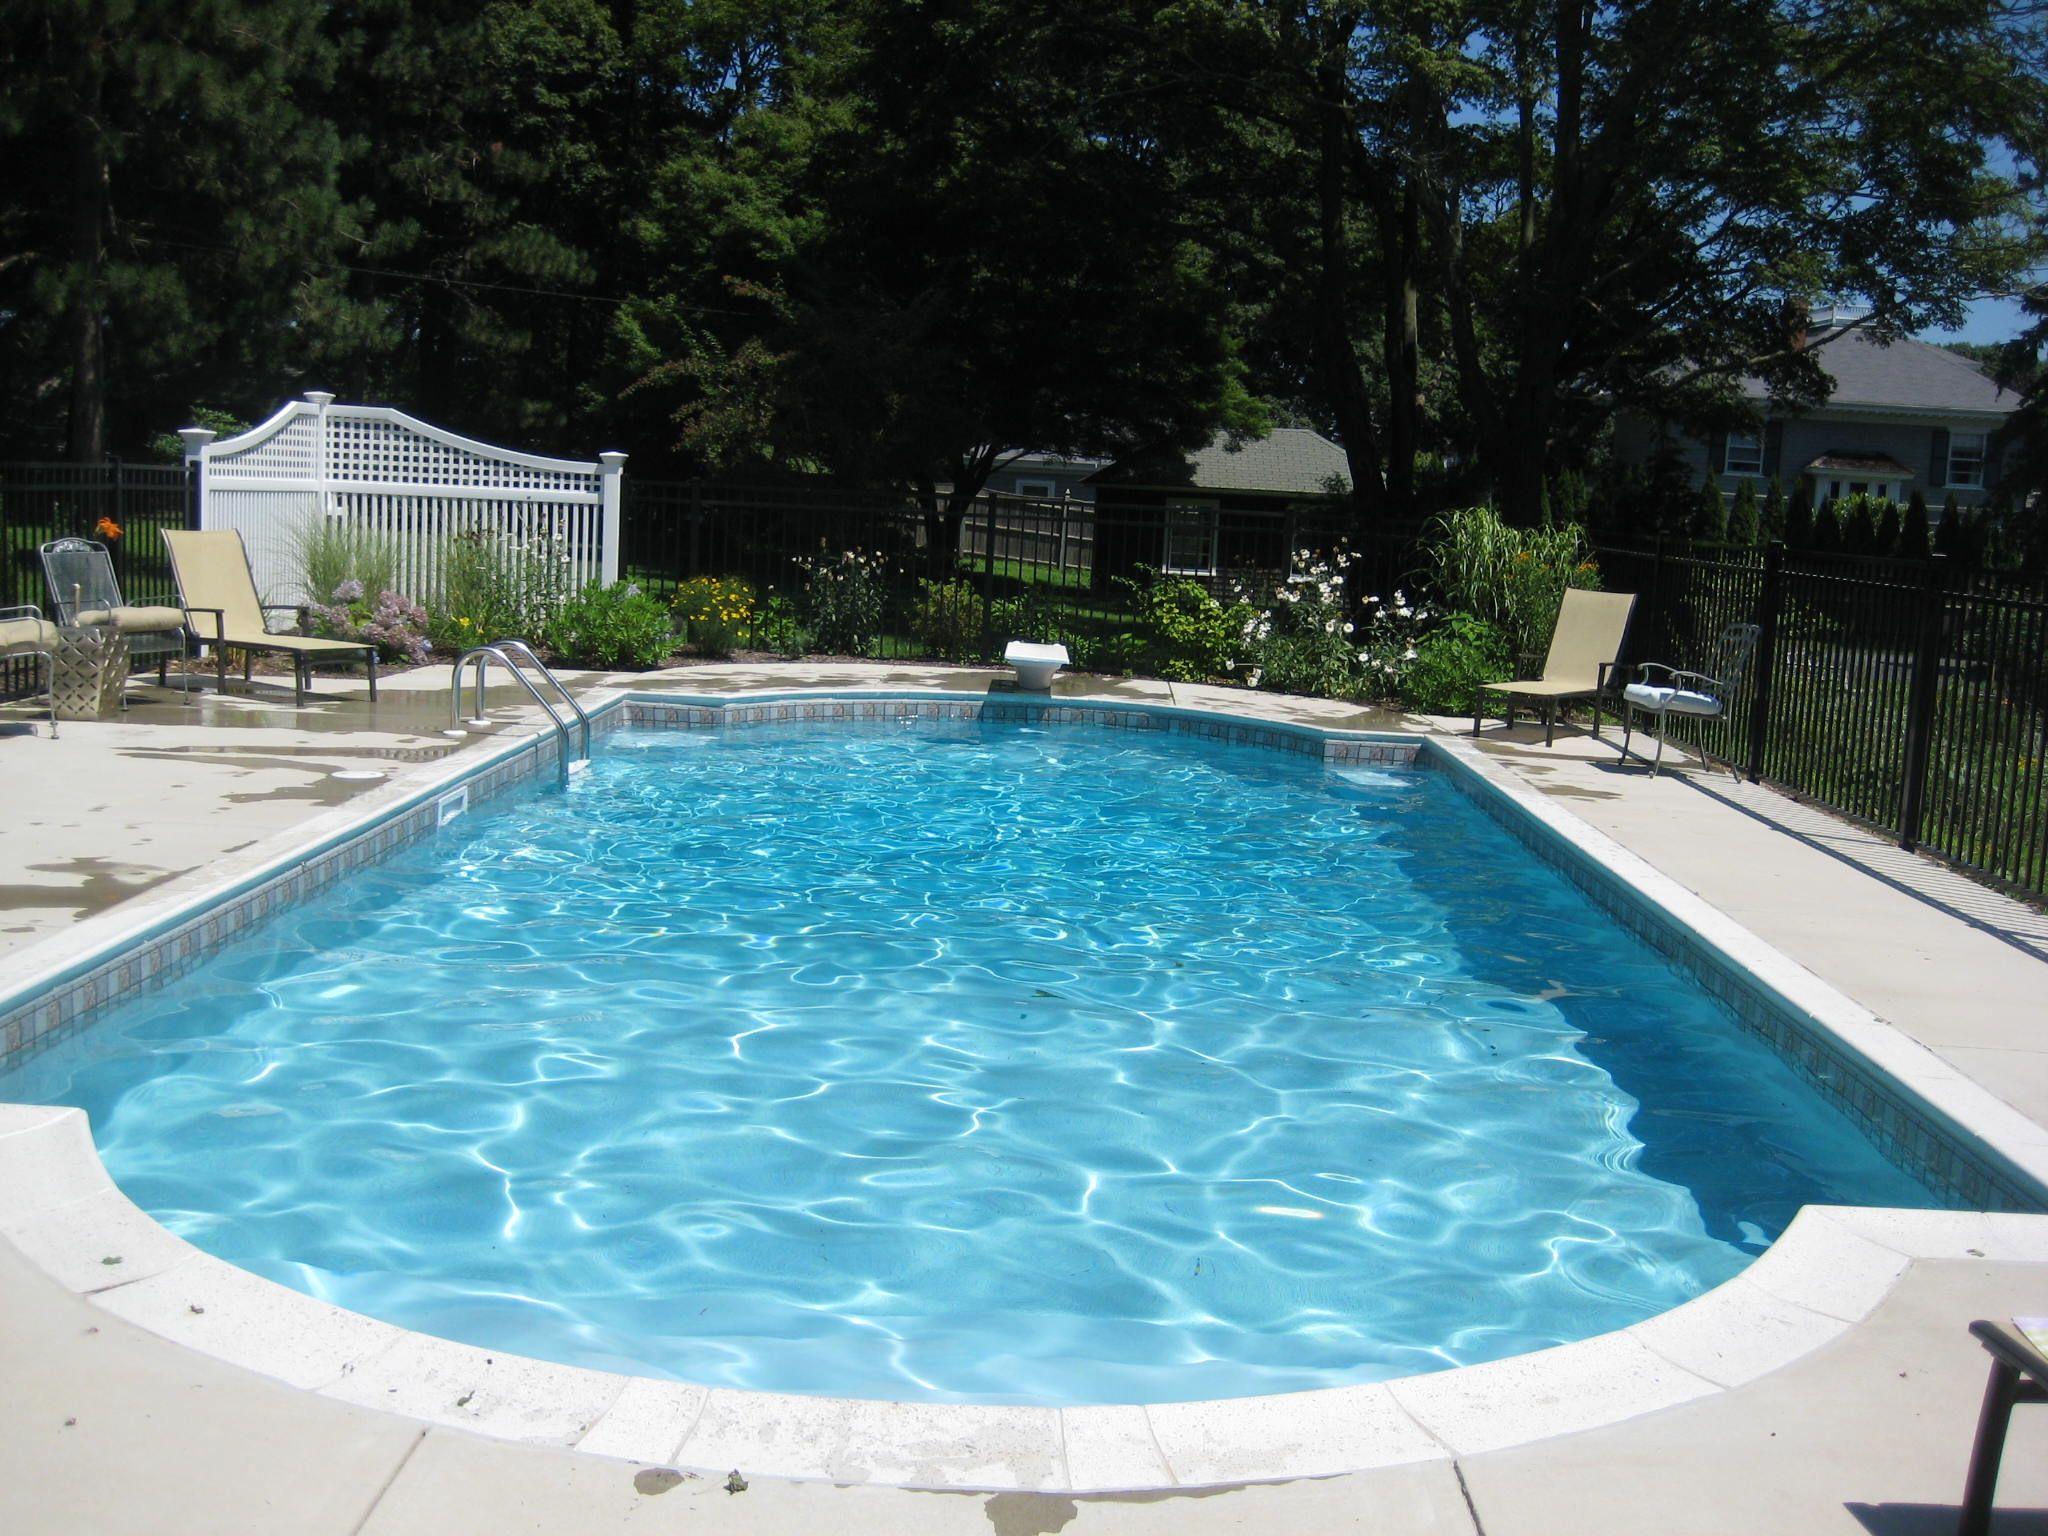 New Pictures Double Roman 0121 Jpg 2048 1536 Roman Pool Backyard Pool Pool Landscaping